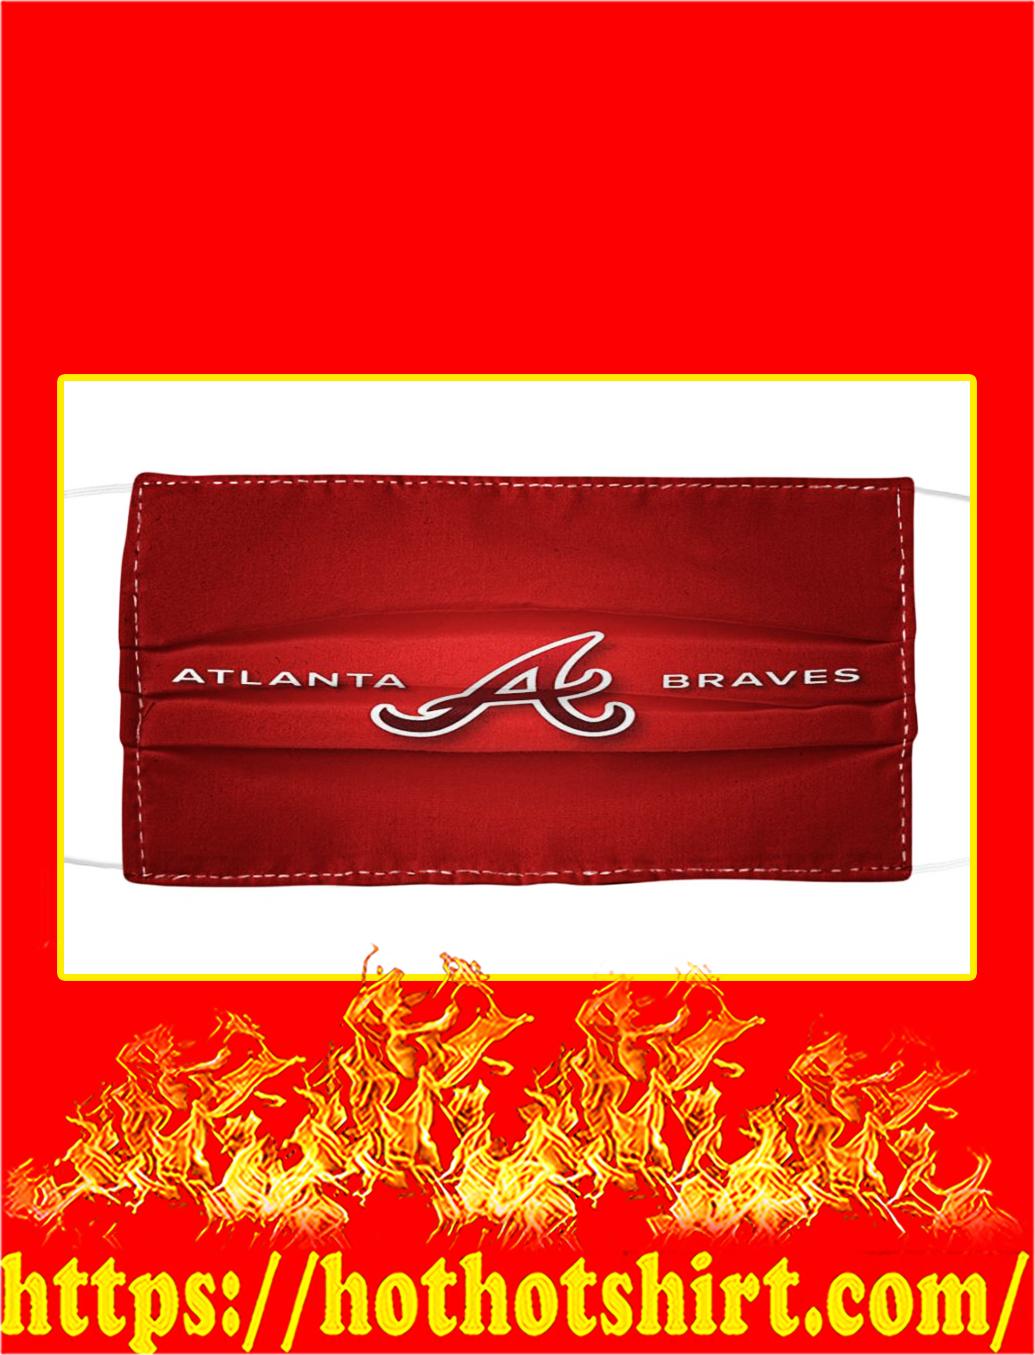 Allanta Braves Cloth Face Mask- pic 1